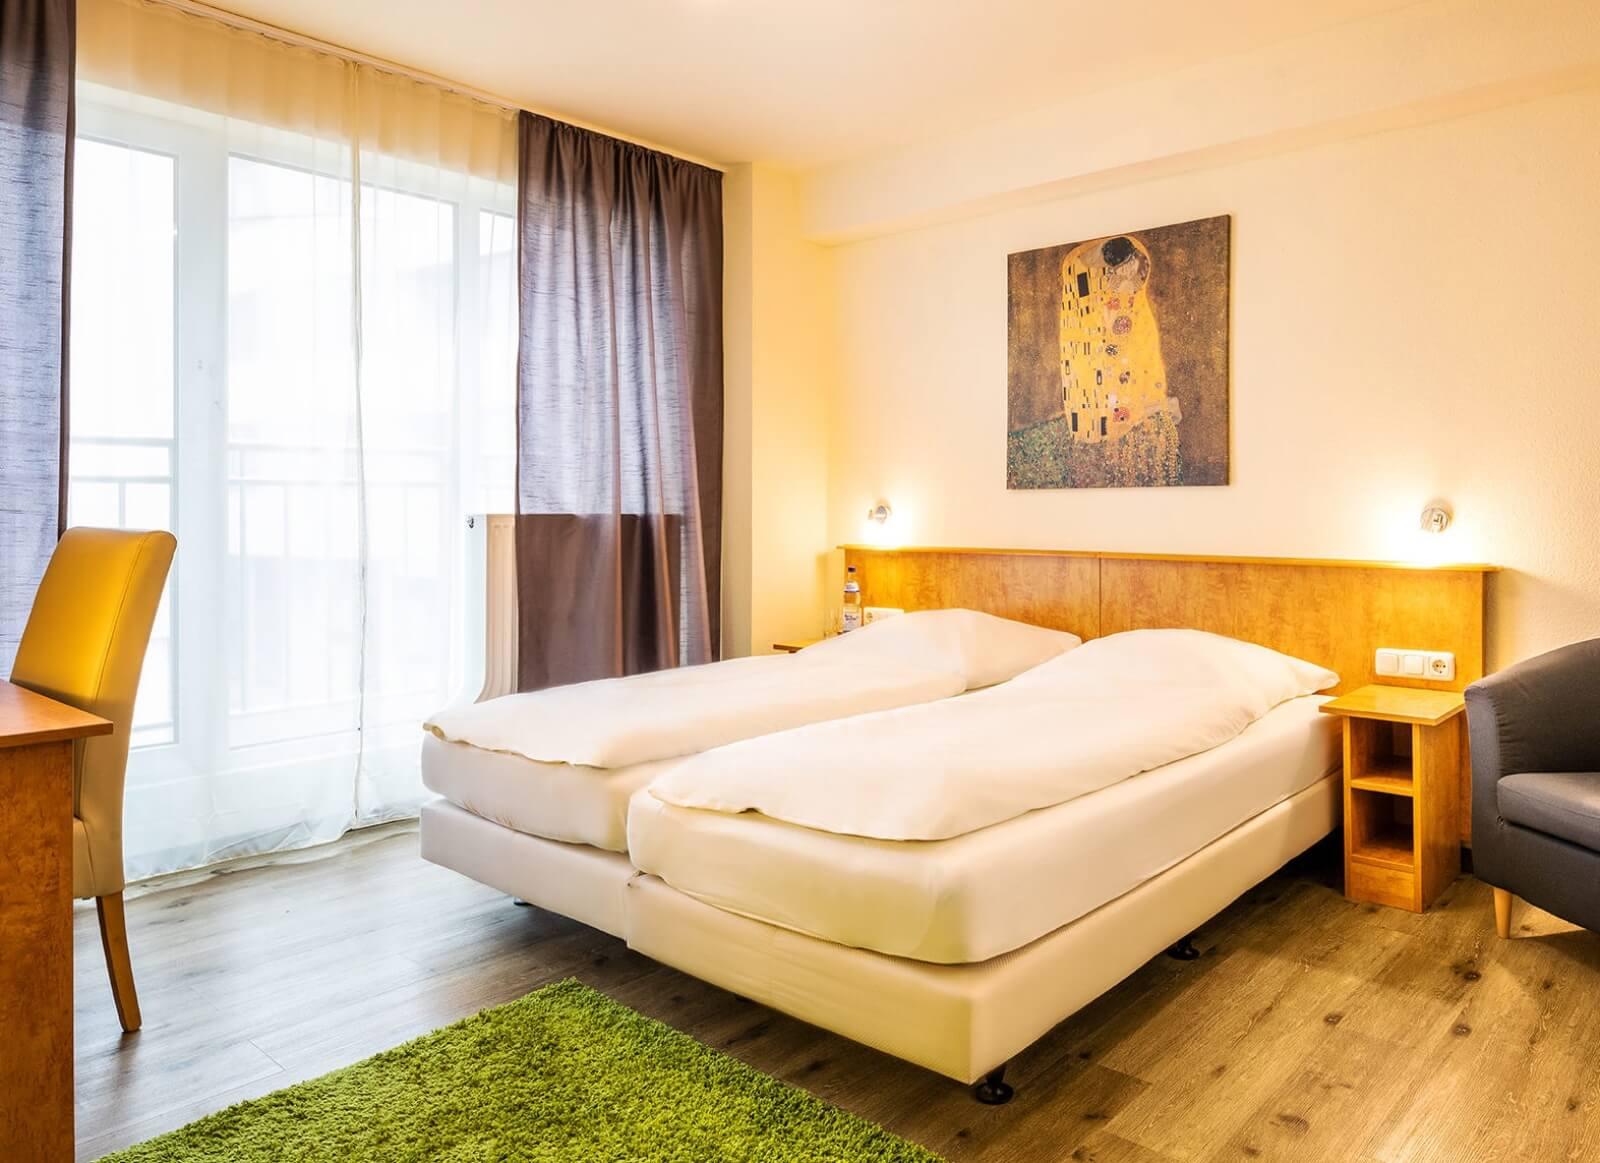 Schroeders Hotels in Trier